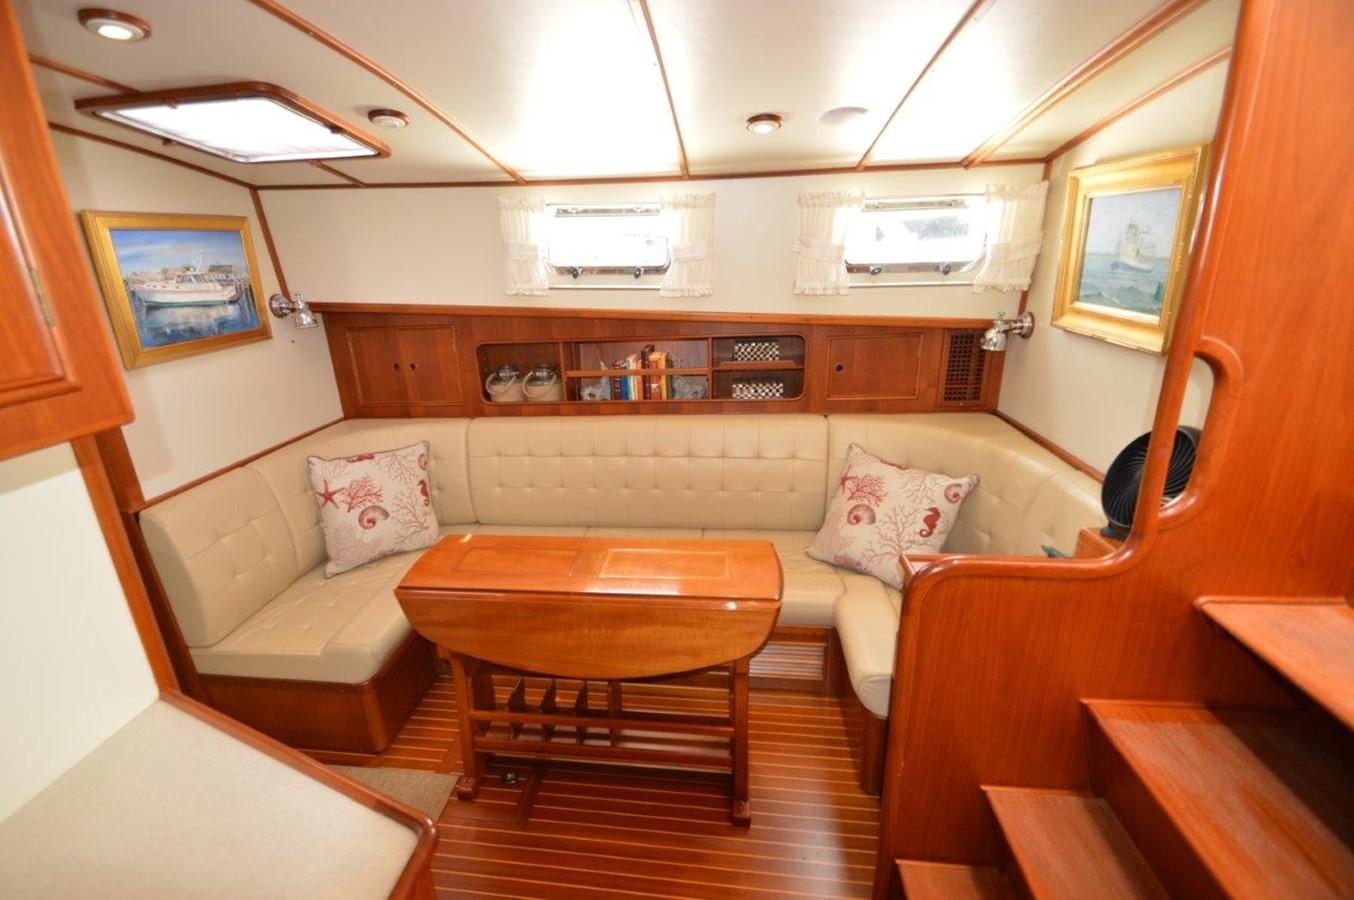 2000 GRAND BANKS 49 Eastbay HX Cruiser 2669755